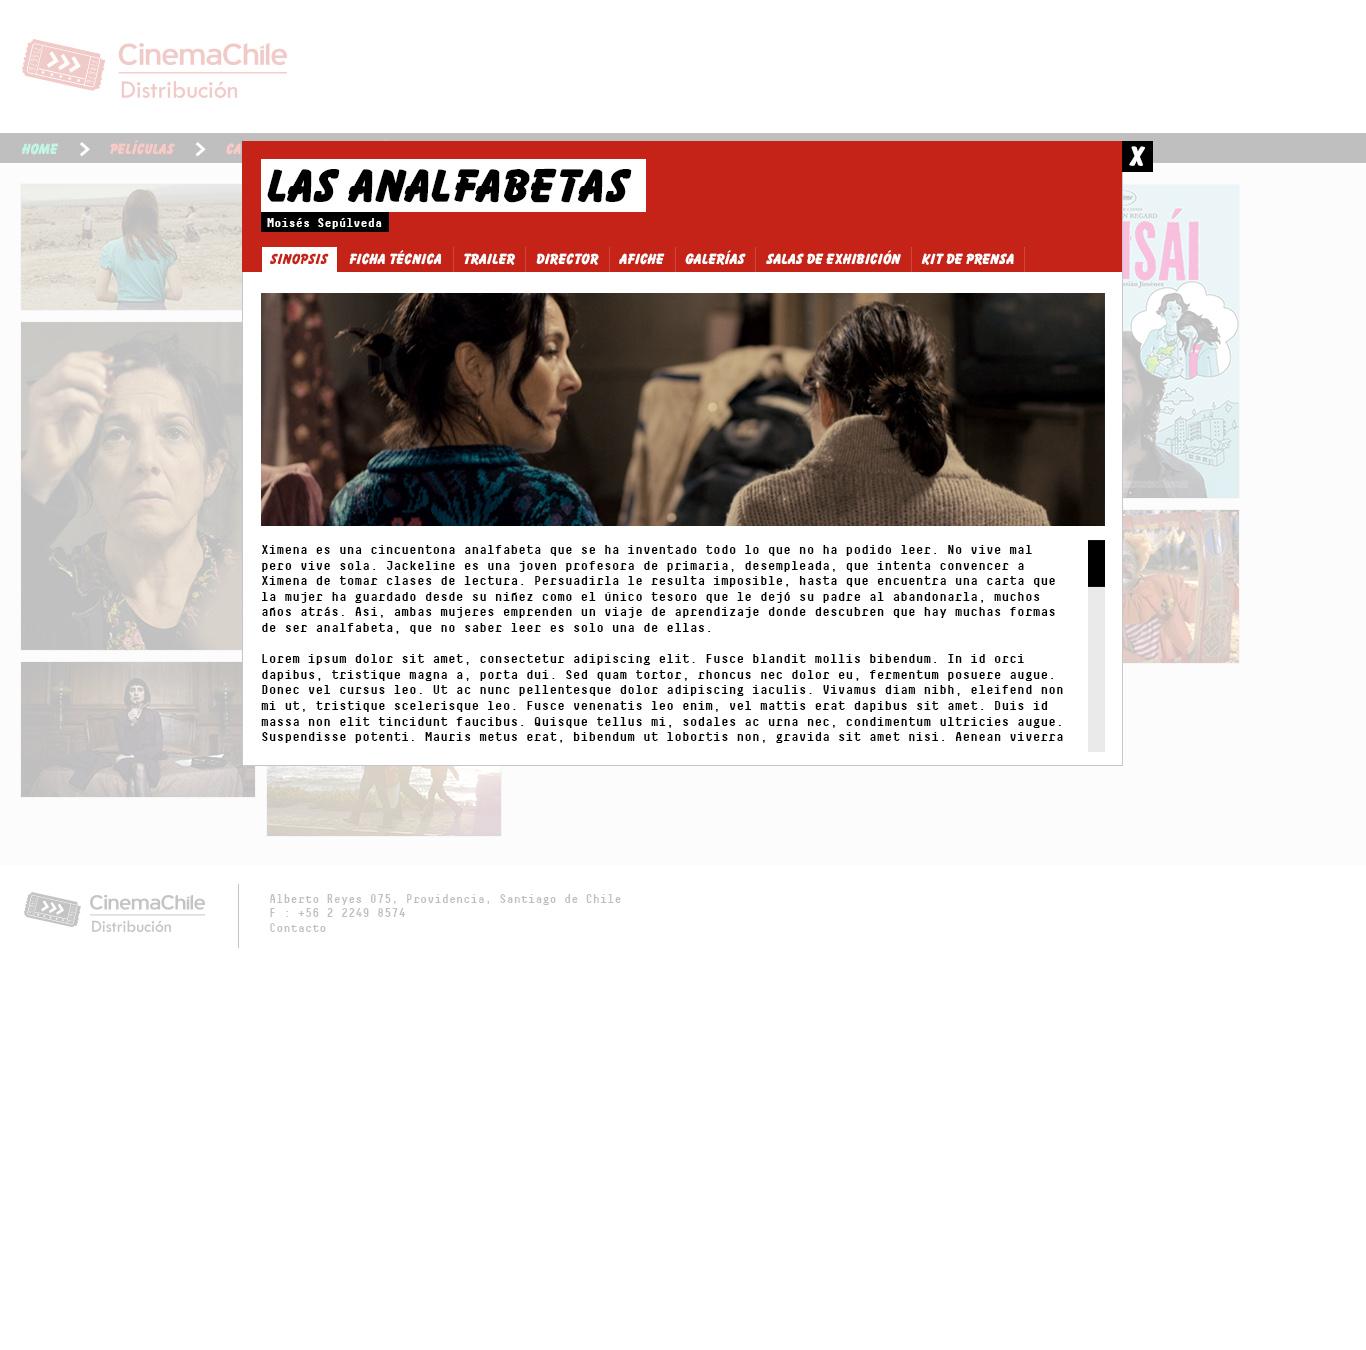 CinemaChileDis_03c